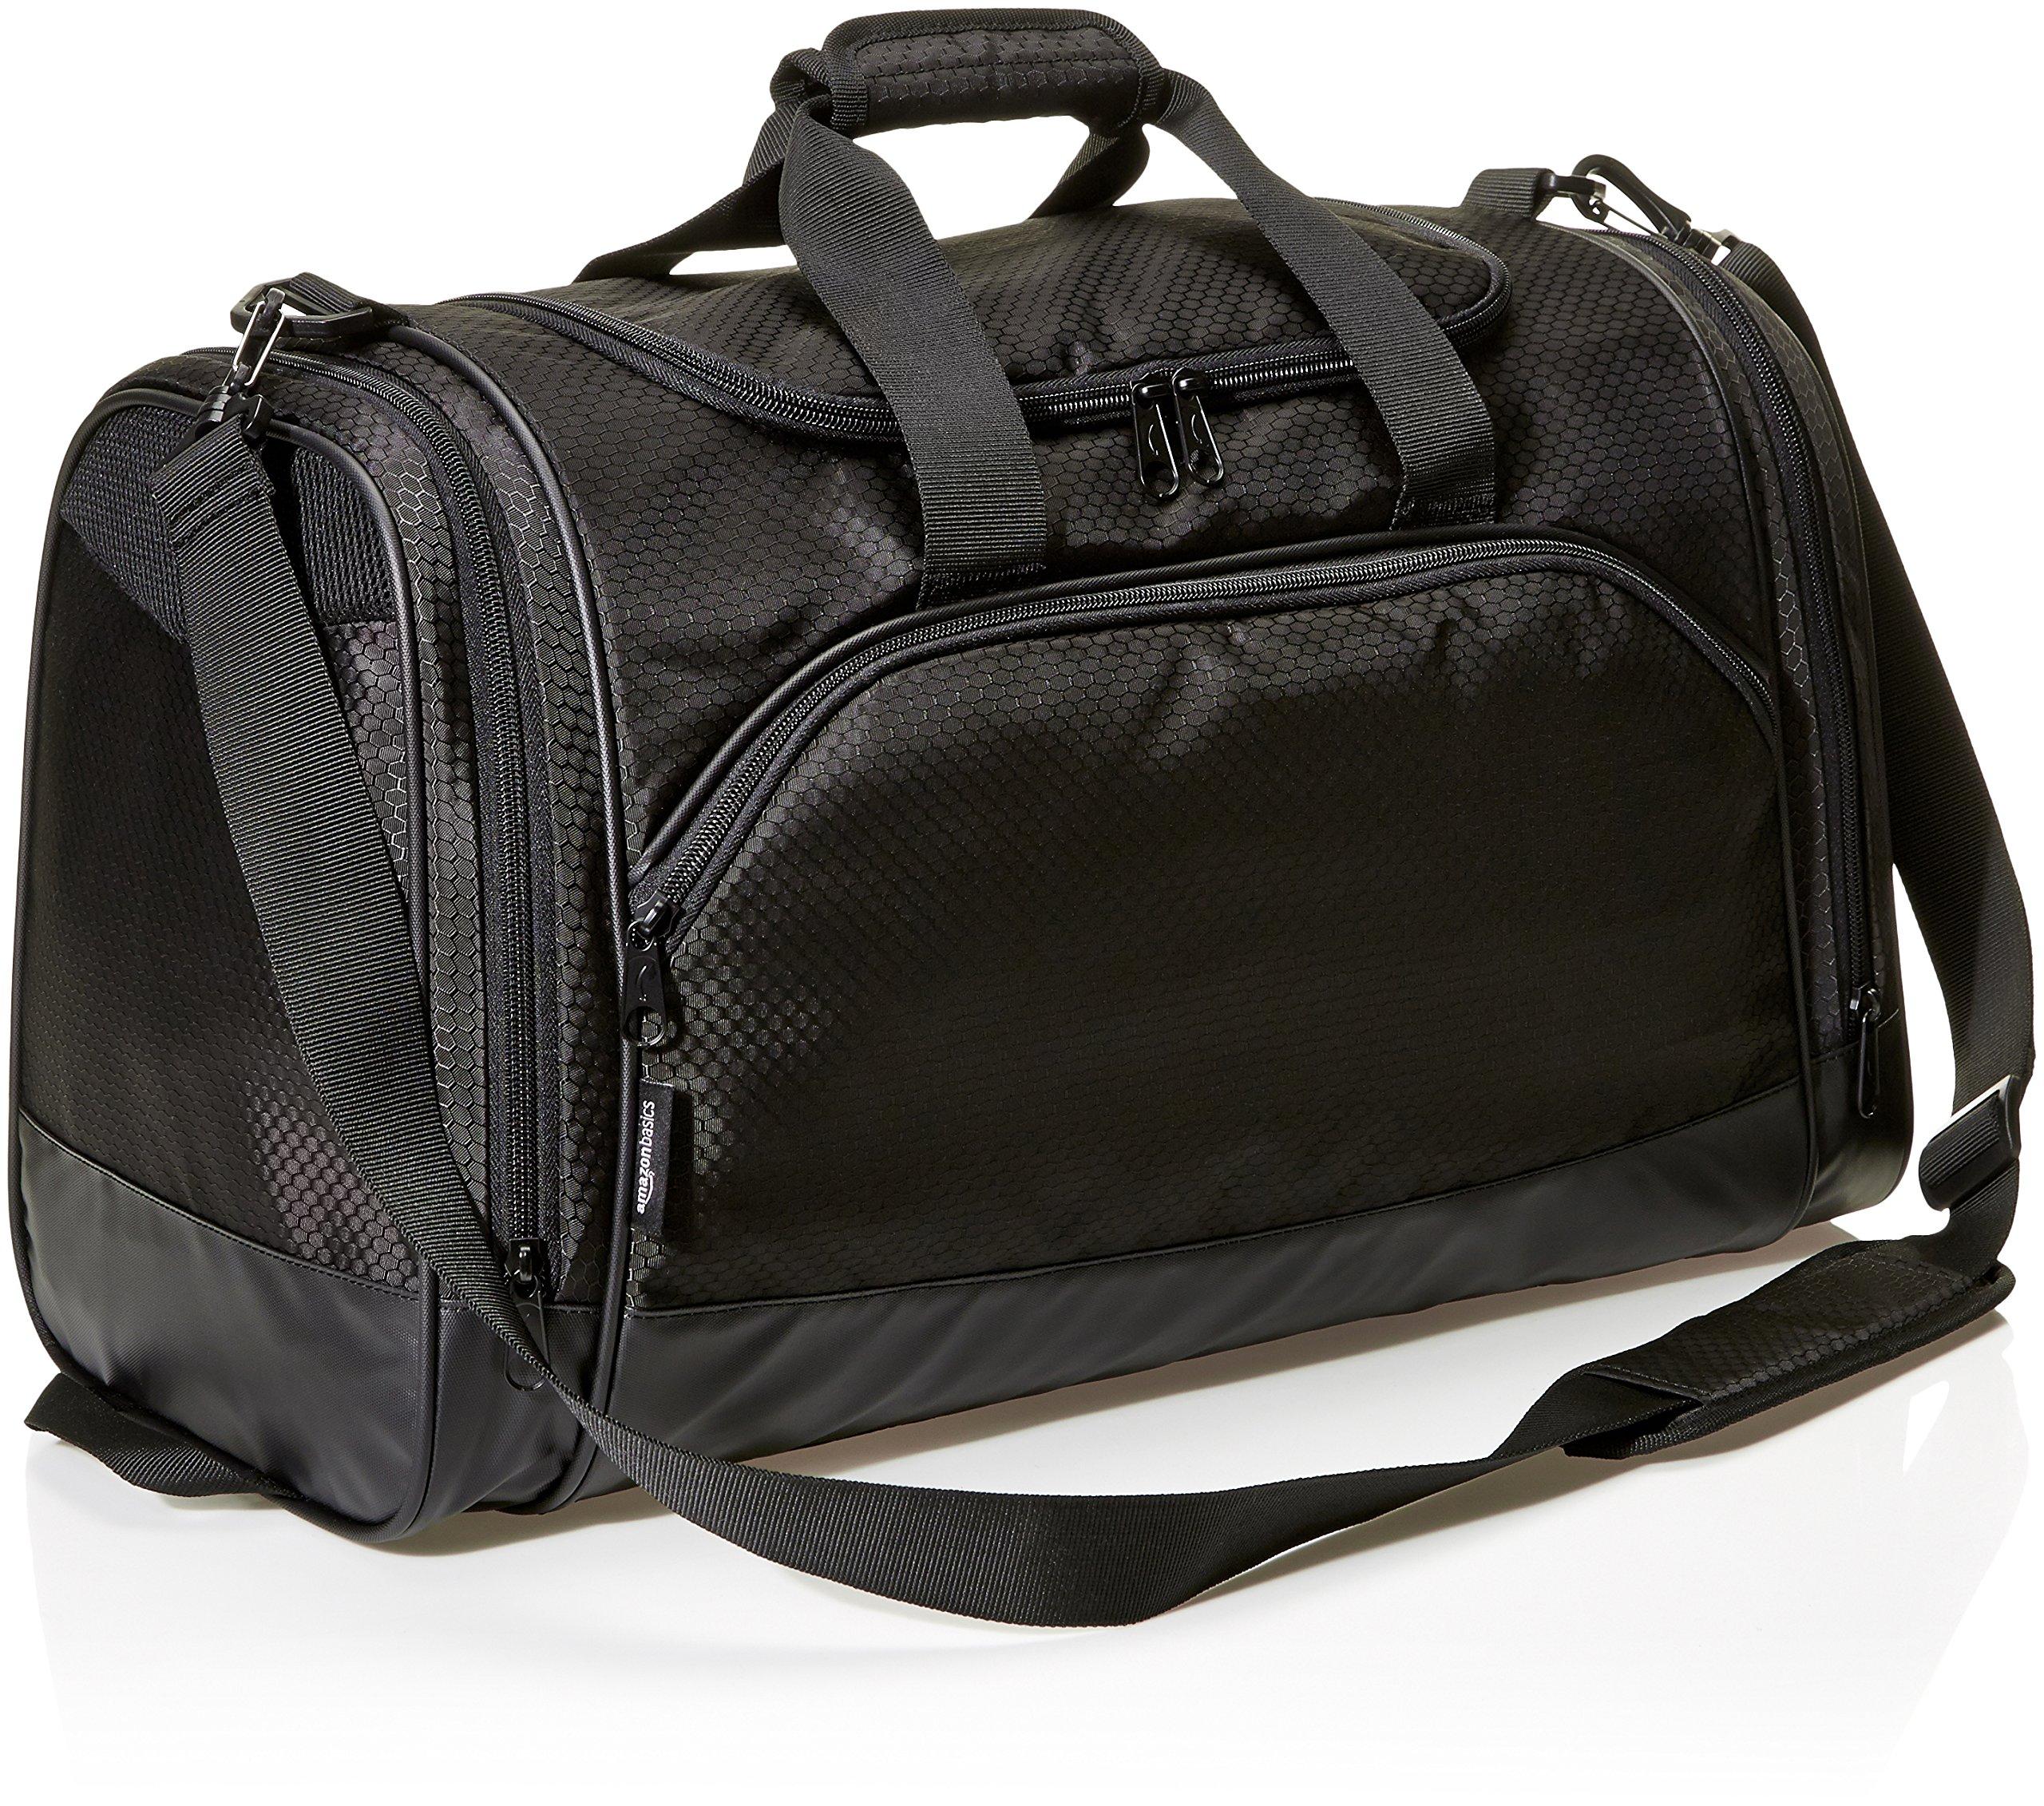 AmazonBasics Small Lightweight Durable Sports Duffel Gym and Overnight Travel Bag - Black by AmazonBasics